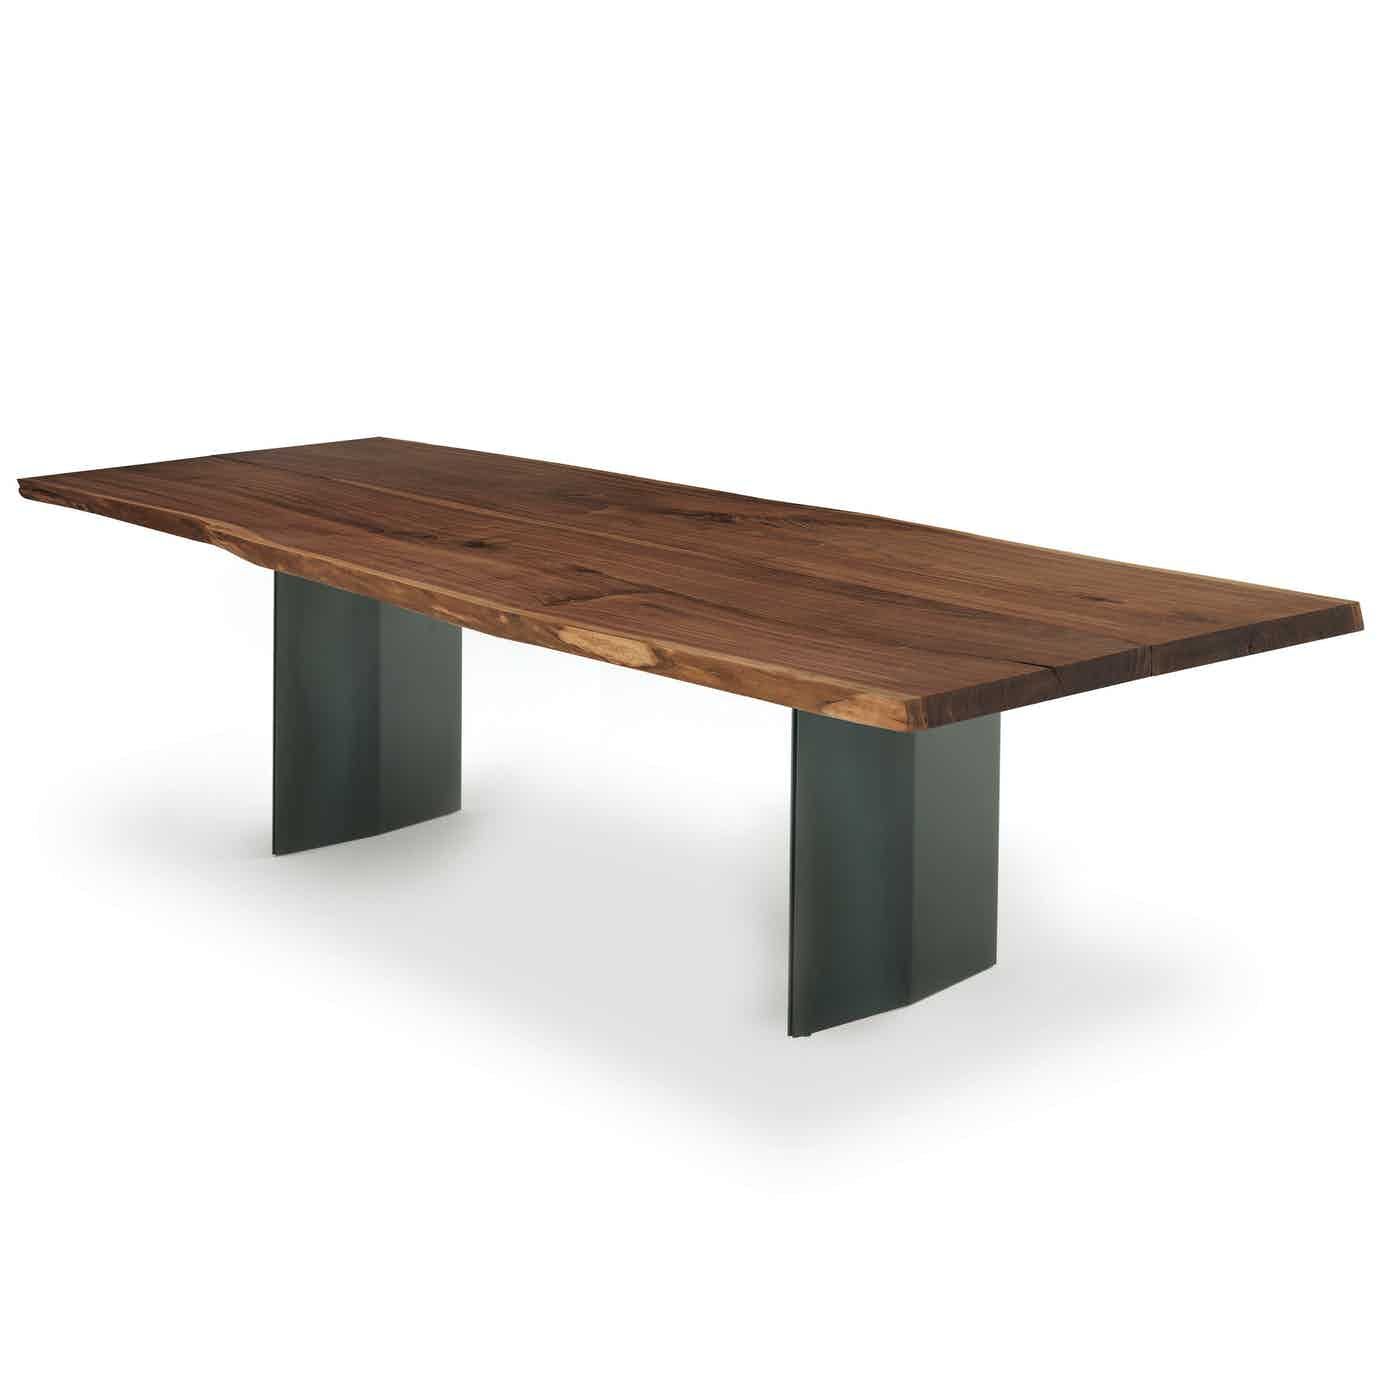 Riva-1920-natura-table-angle-thumbnail-haute-living